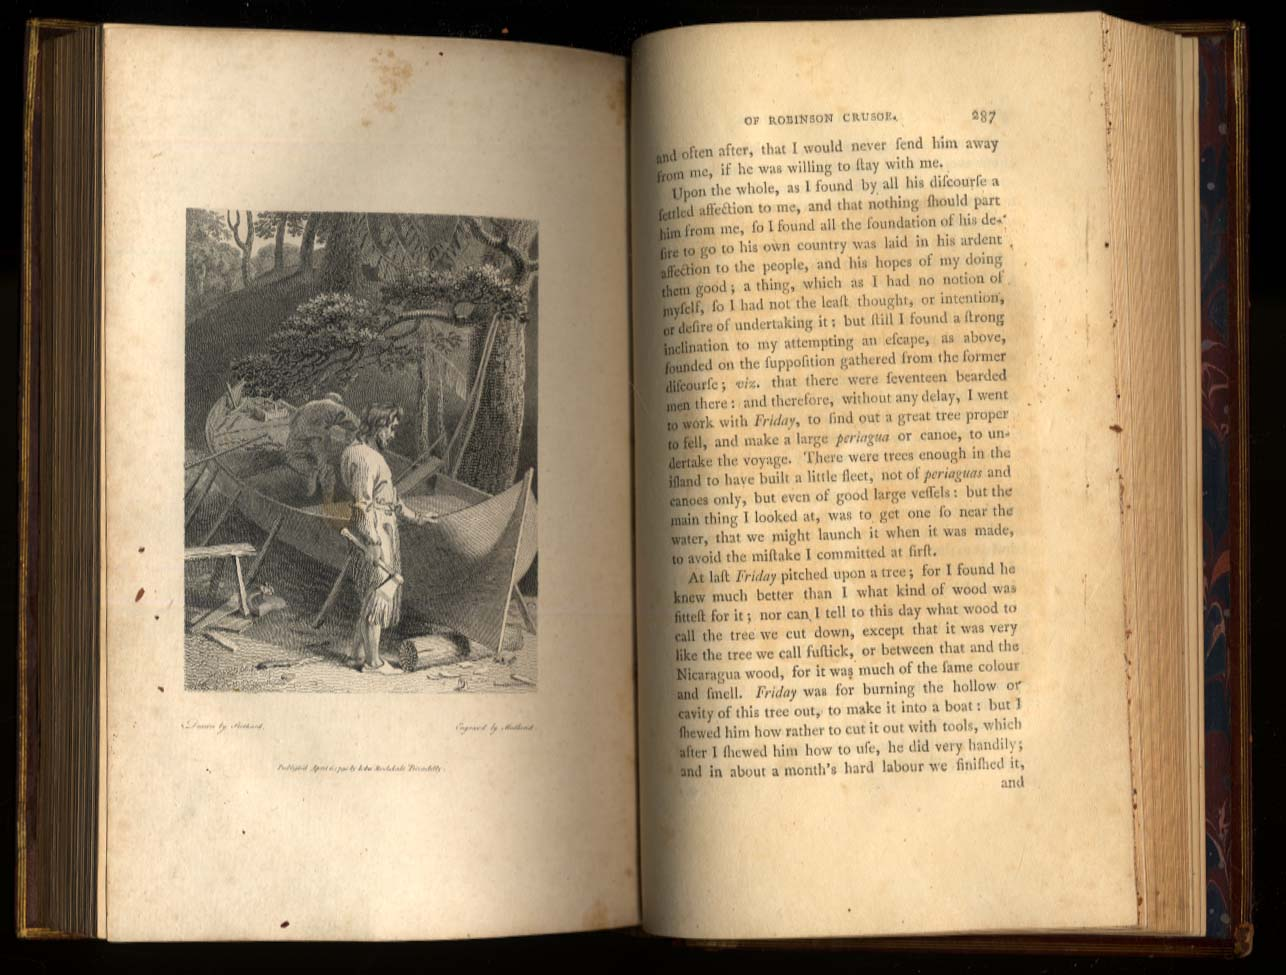 Daniel DeFoe: Life & Strange Adventures of Robinson Crusoe 1790 1st Strothard ed